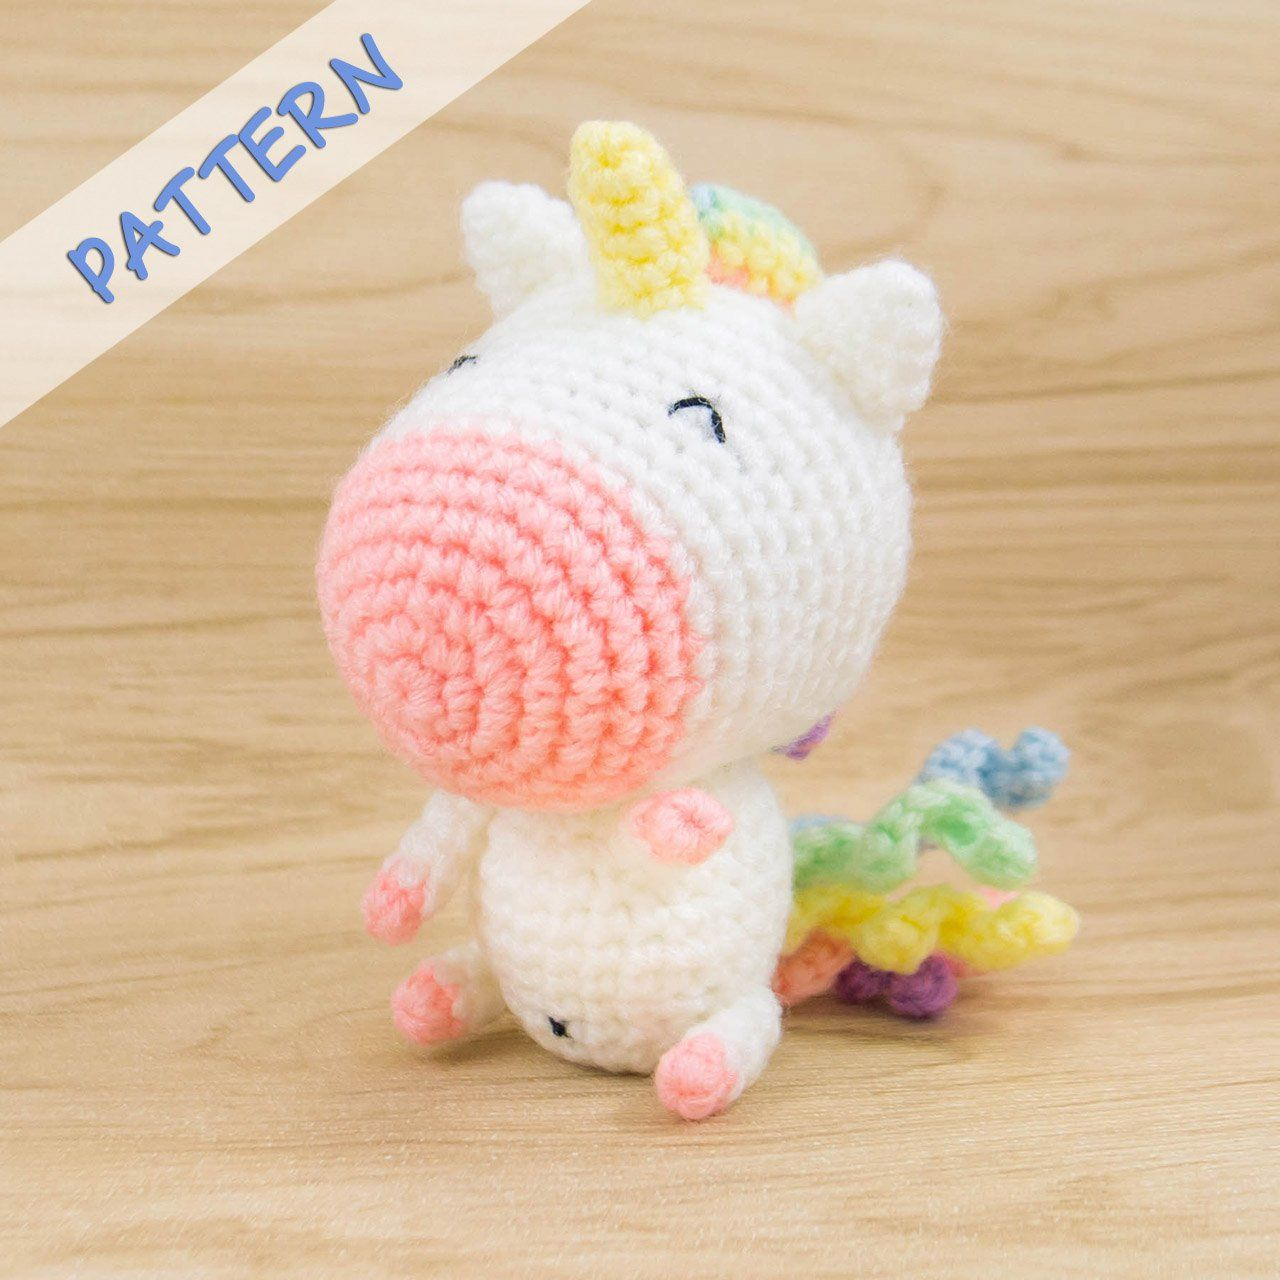 10+ Crochet Unicorn with Free Patterns | Patrón de conejito de ... | 1280x1280